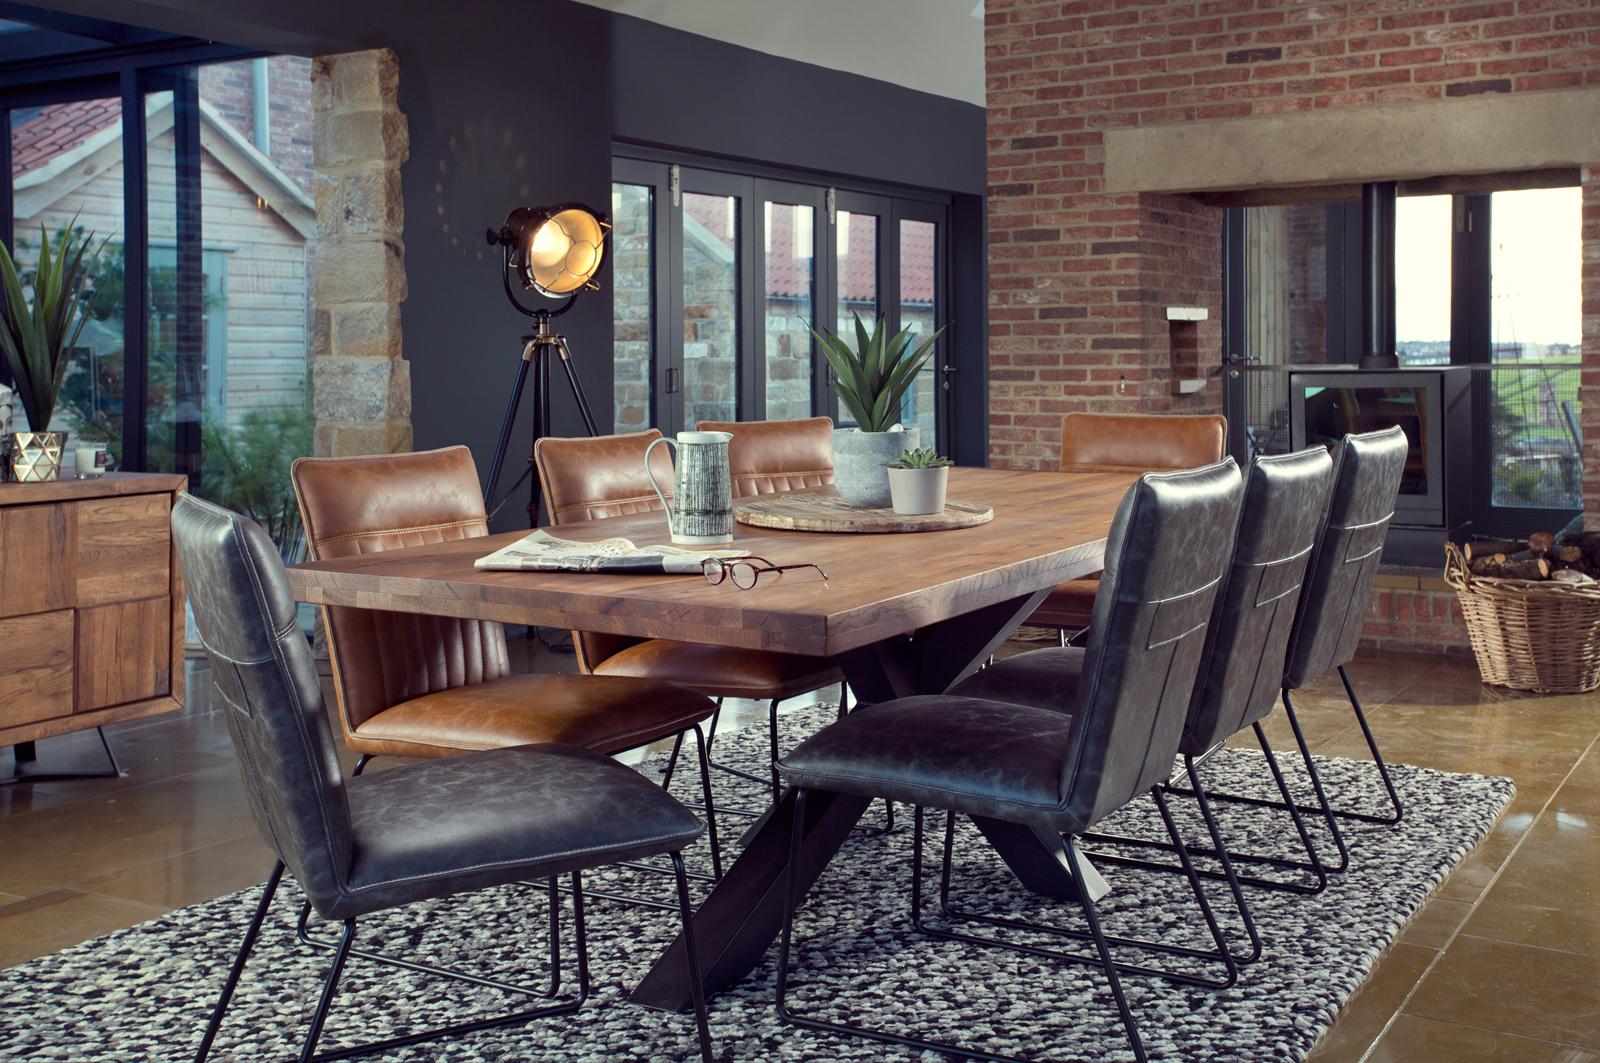 Table salle manger bois m tal pied crois 200 cm oka - Table salle a manger design pied central ...